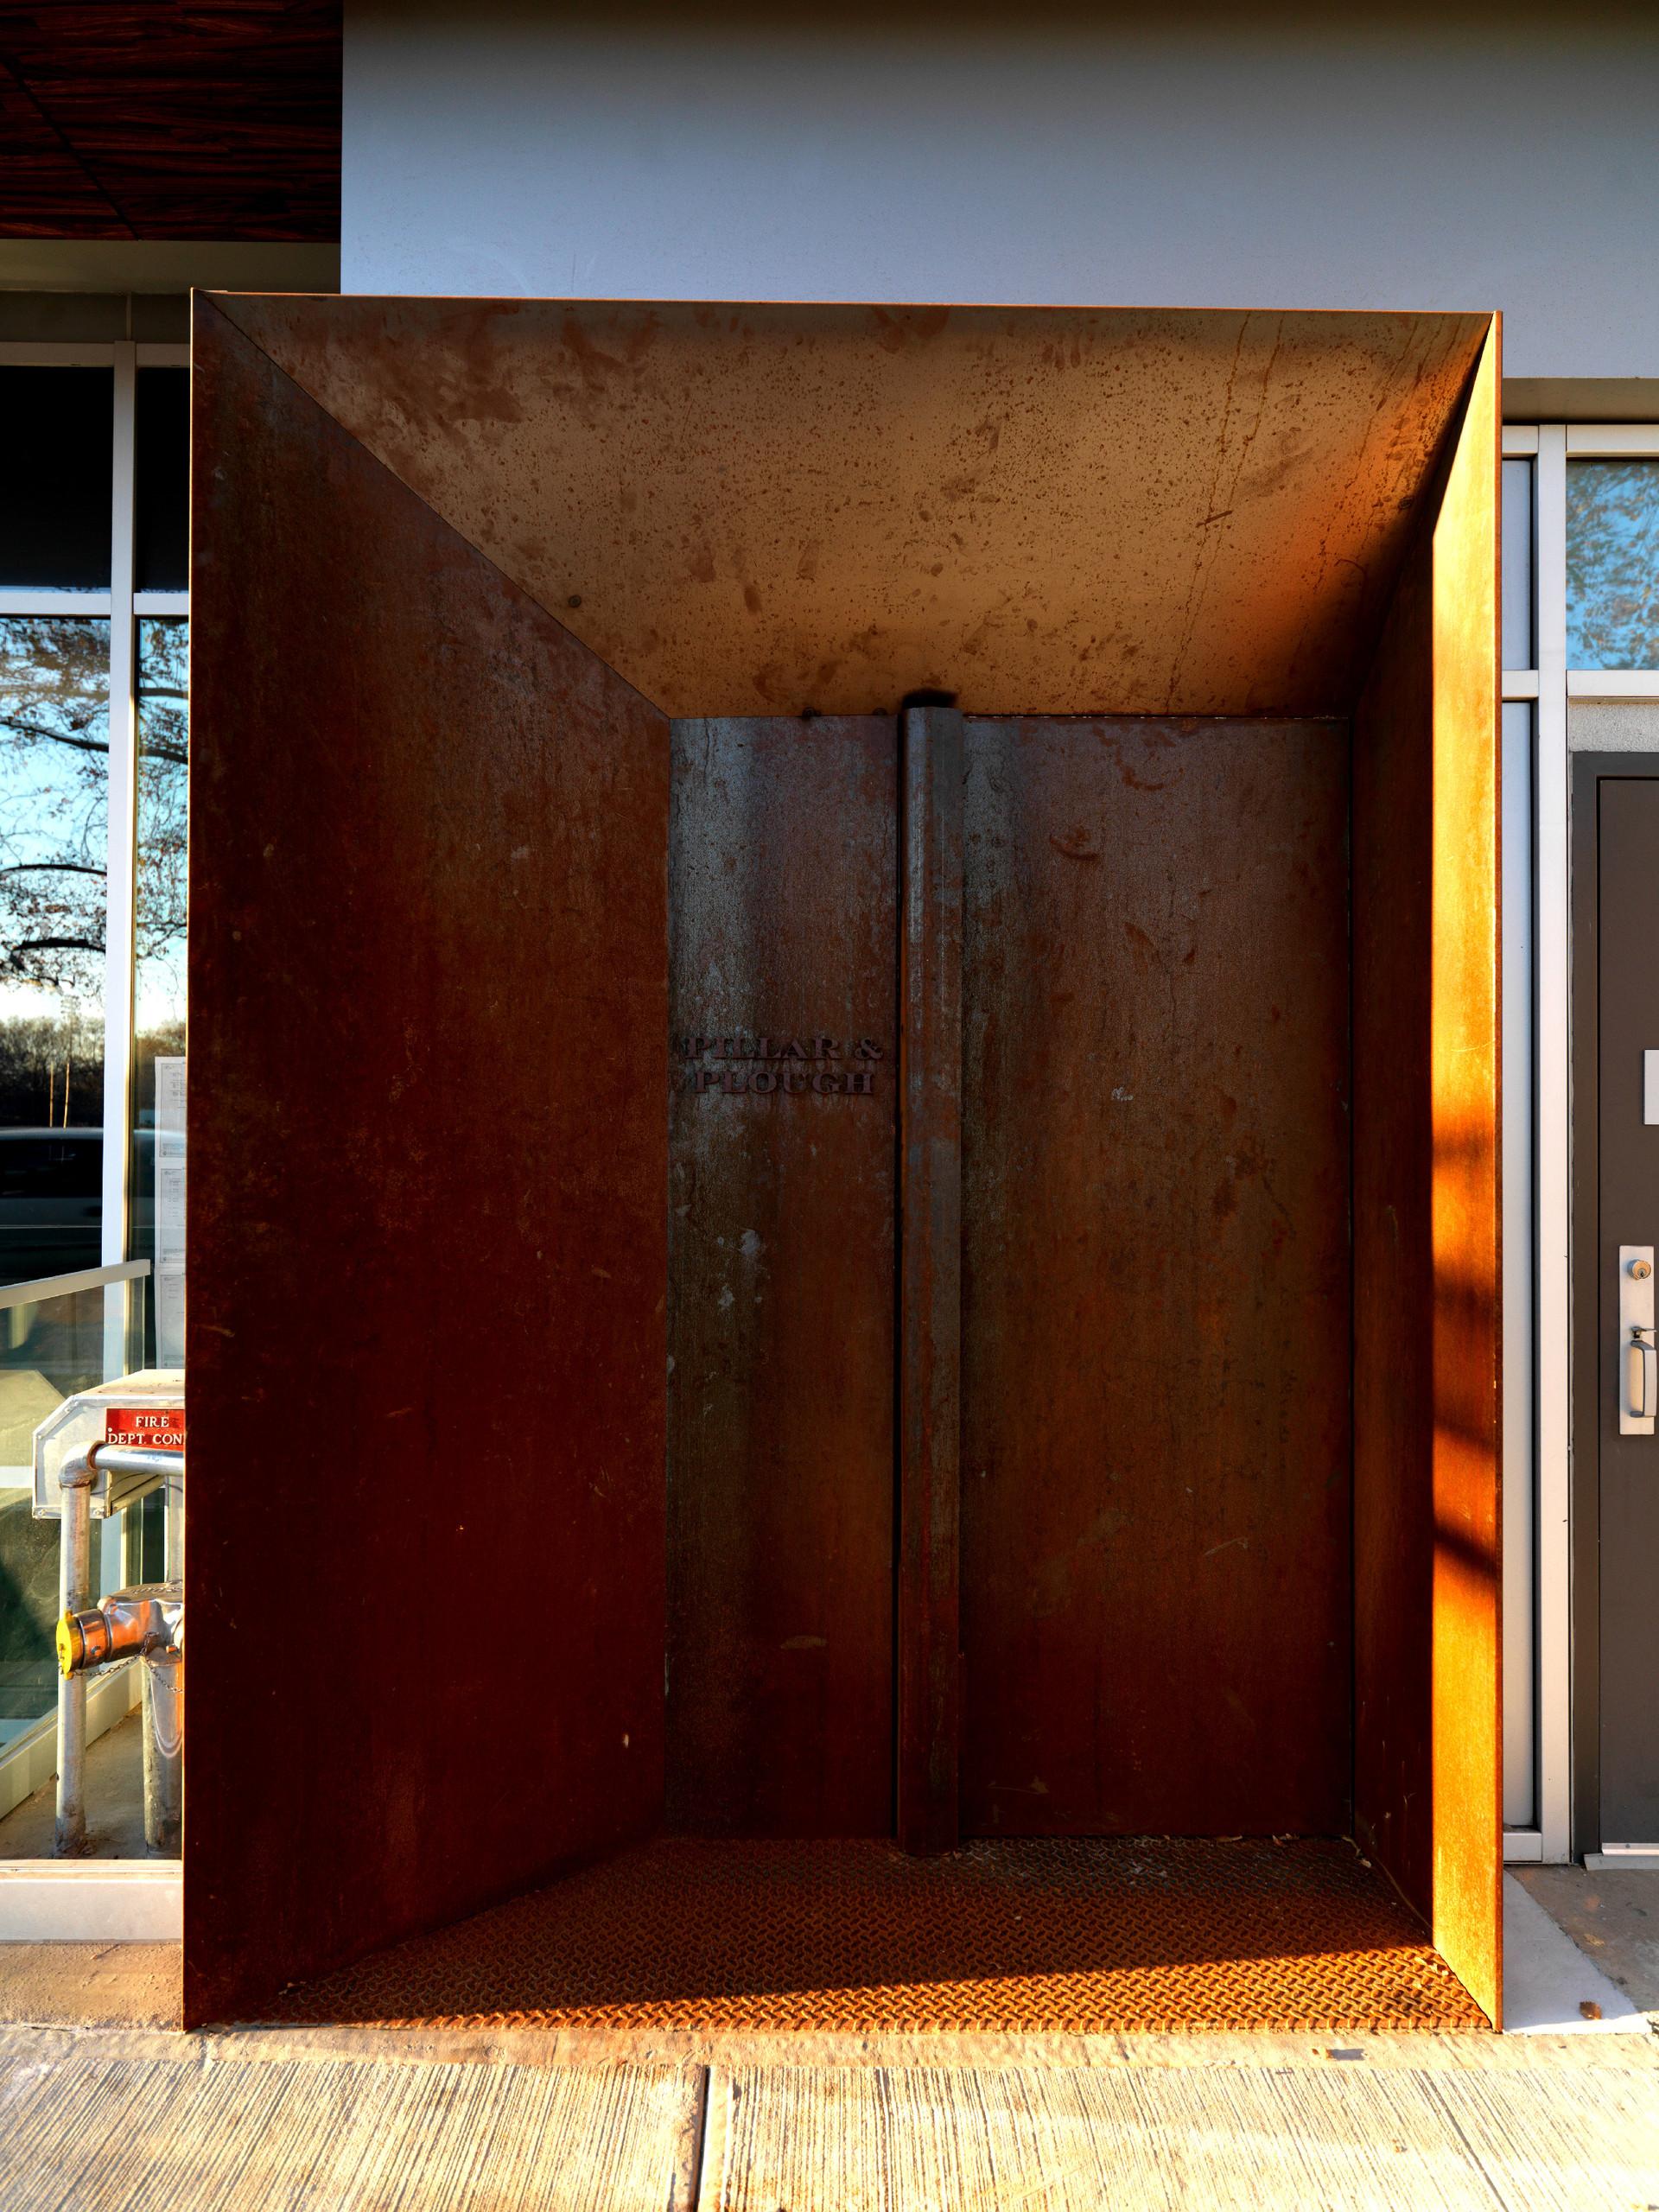 Pillar & Plough, New York